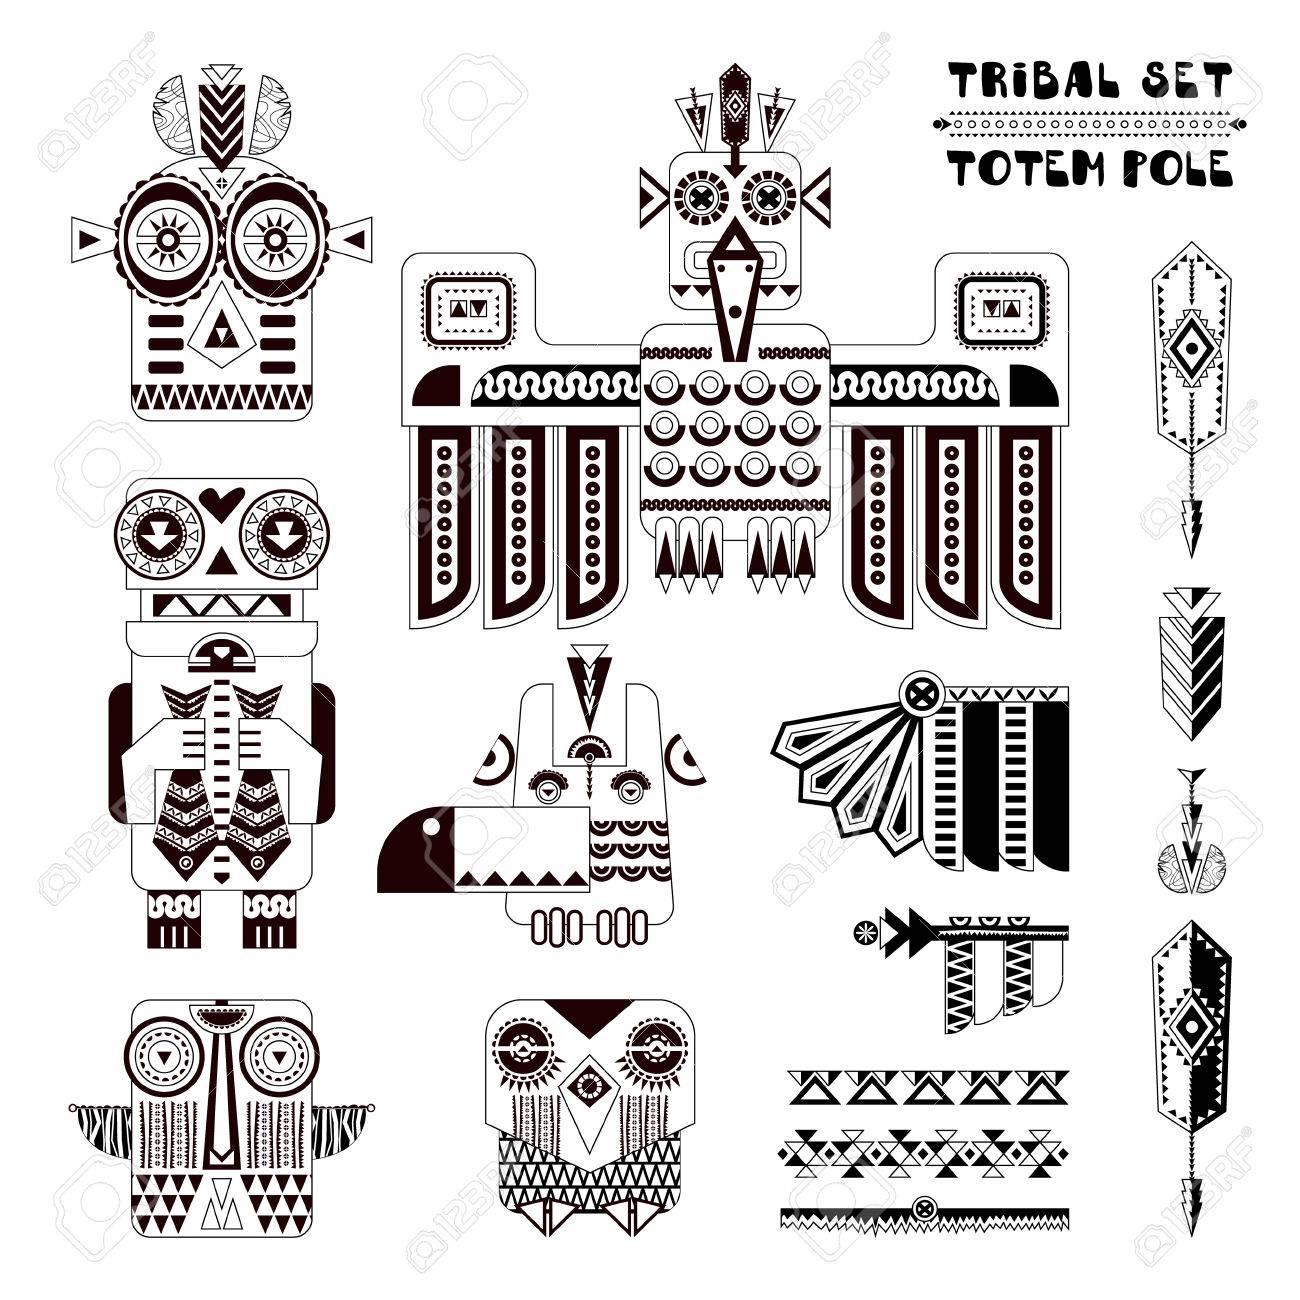 54 alaska totem stock illustrations cliparts and royalty free